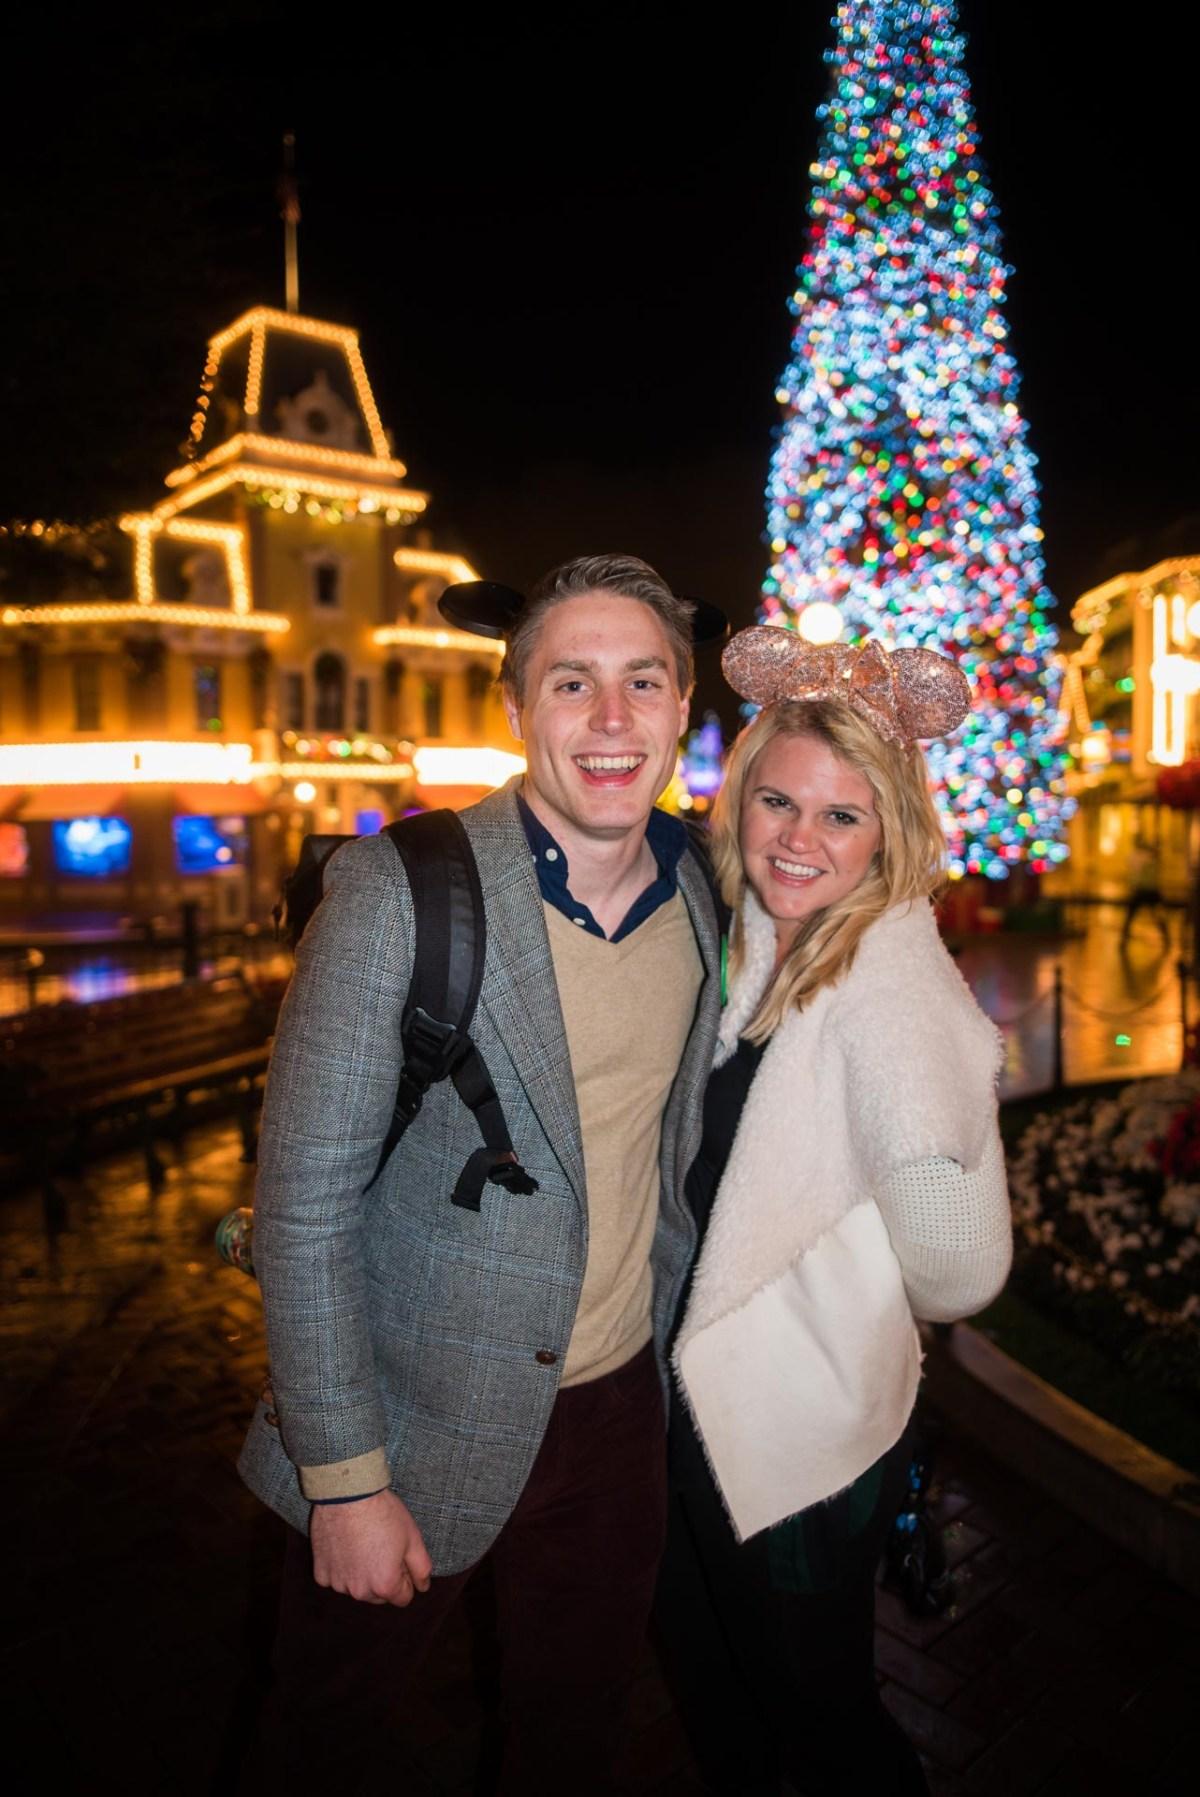 Christmas at Disneyland